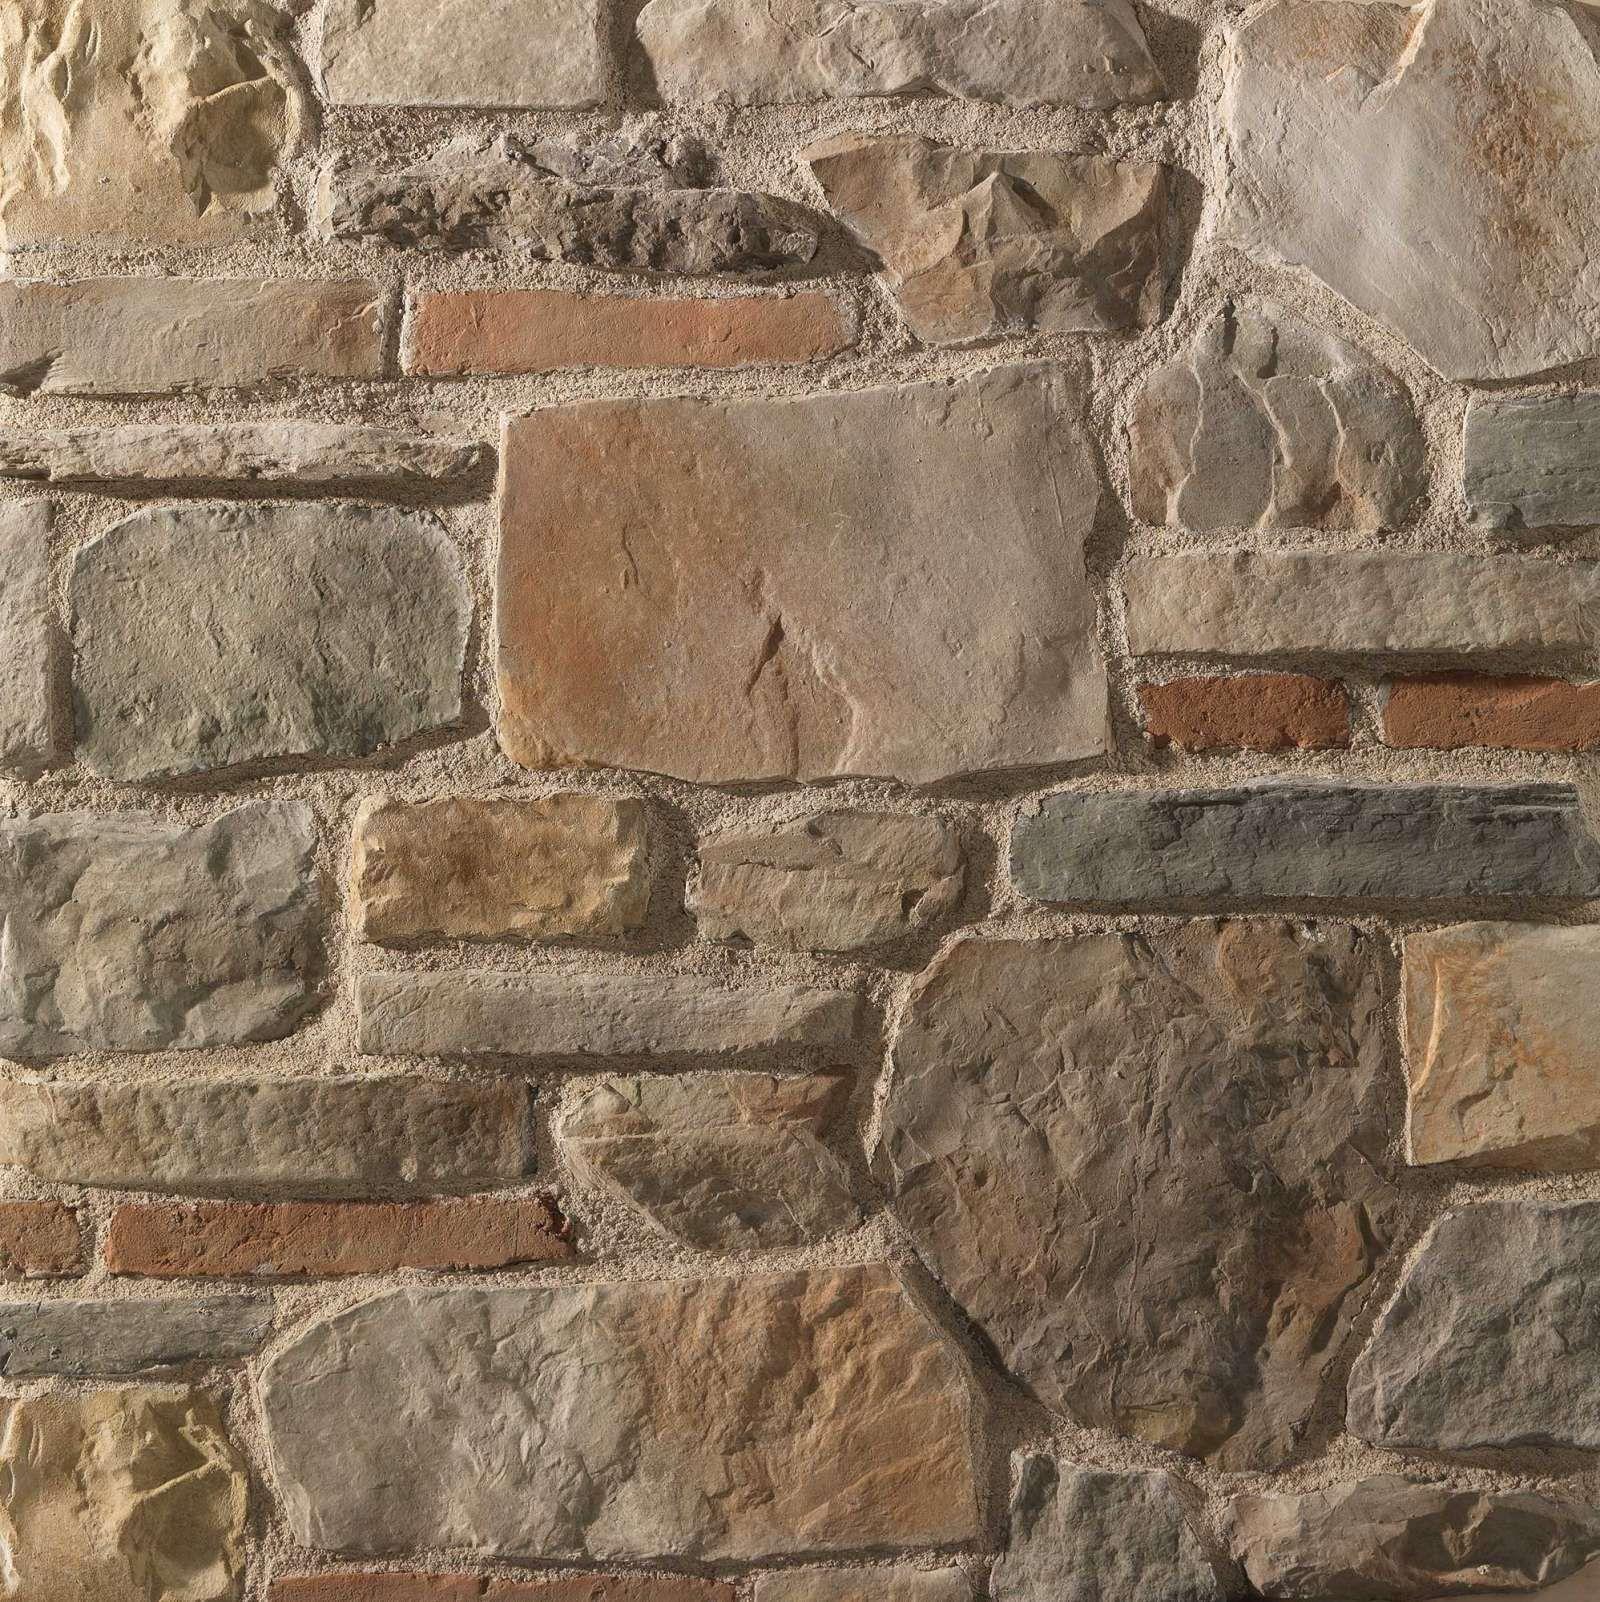 50 idee di pannelli finta pietra leroy merlin image for Finta pietra per interni leroy merlin